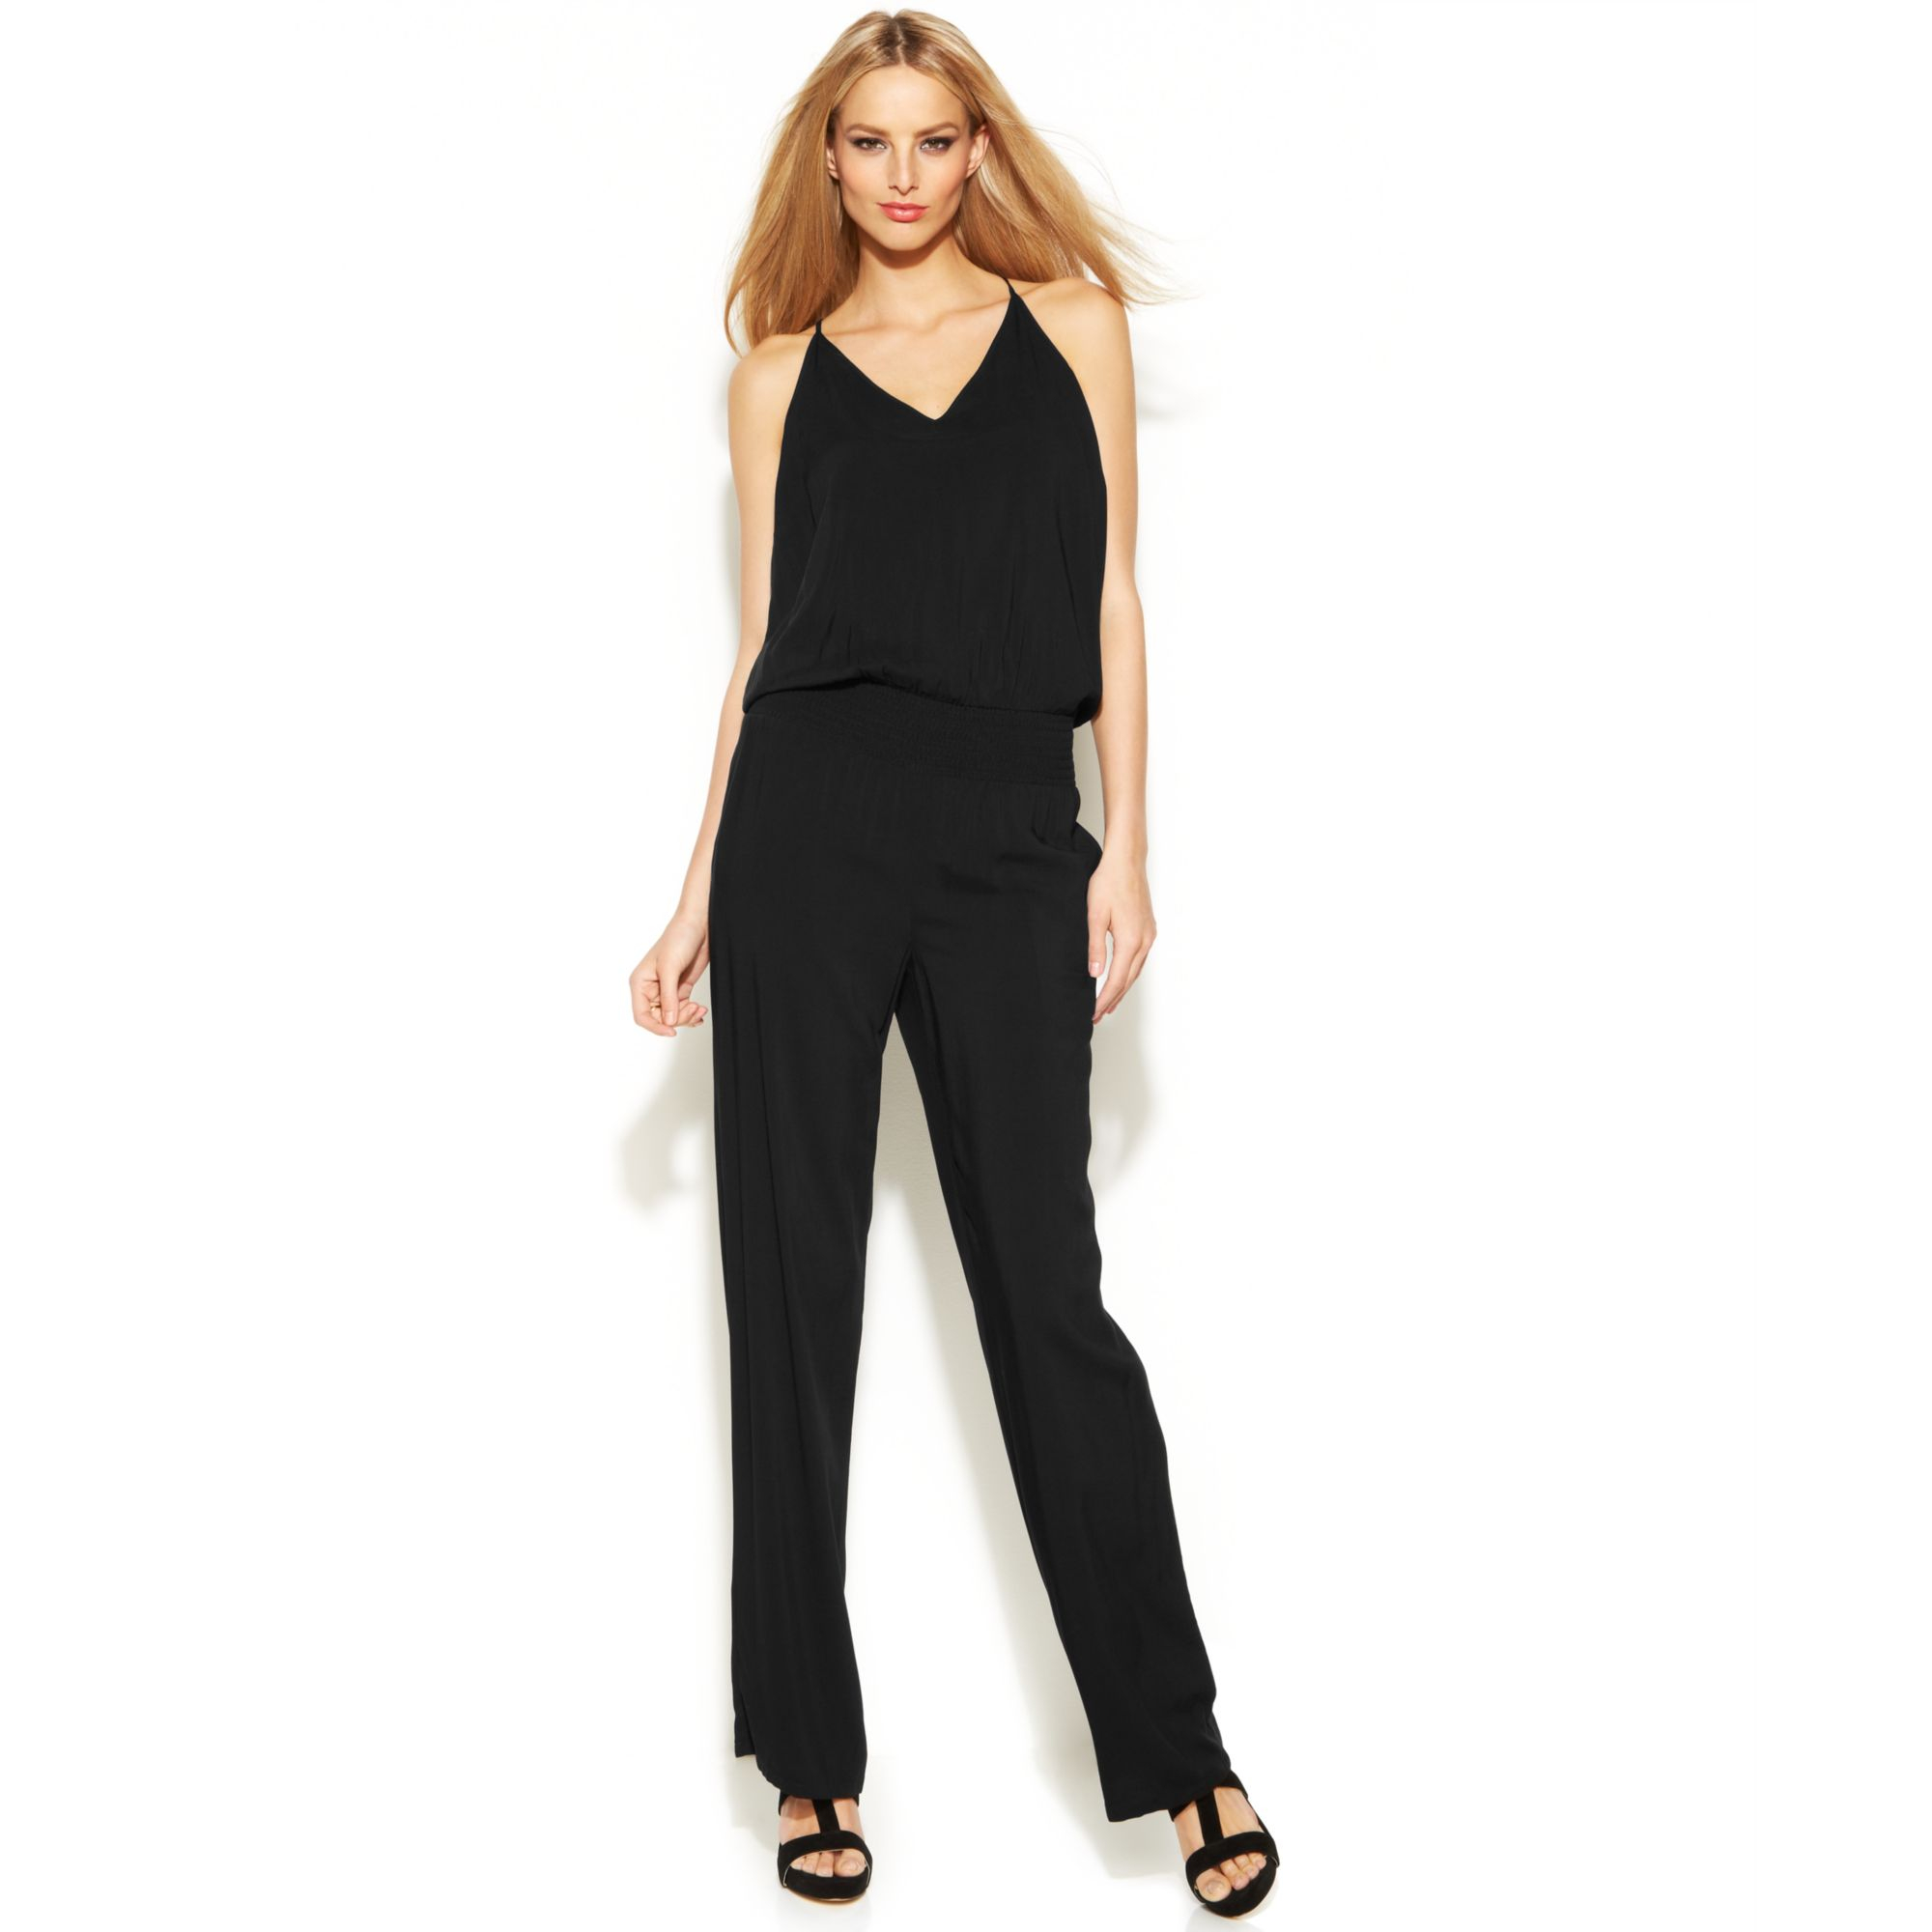 Inc International Concepts Petite Sleeveless Smockedwaist Jumpsuit In Black (Deep Black) | Lyst